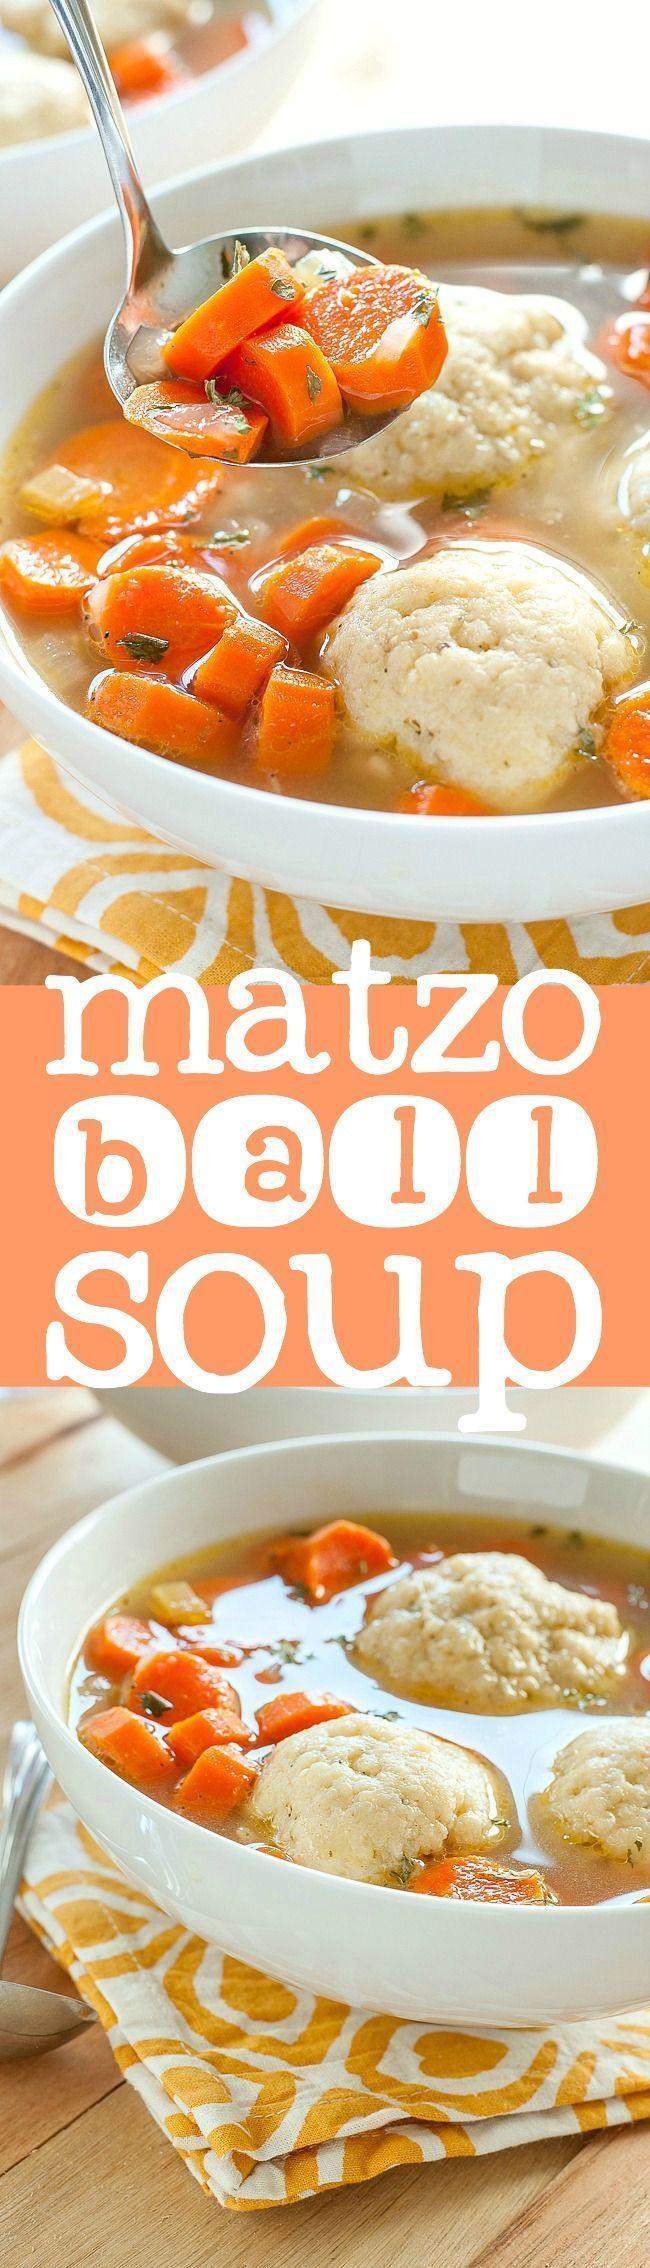 Passover Vegetarian Recipes  Best 25 Passover meal ideas on Pinterest